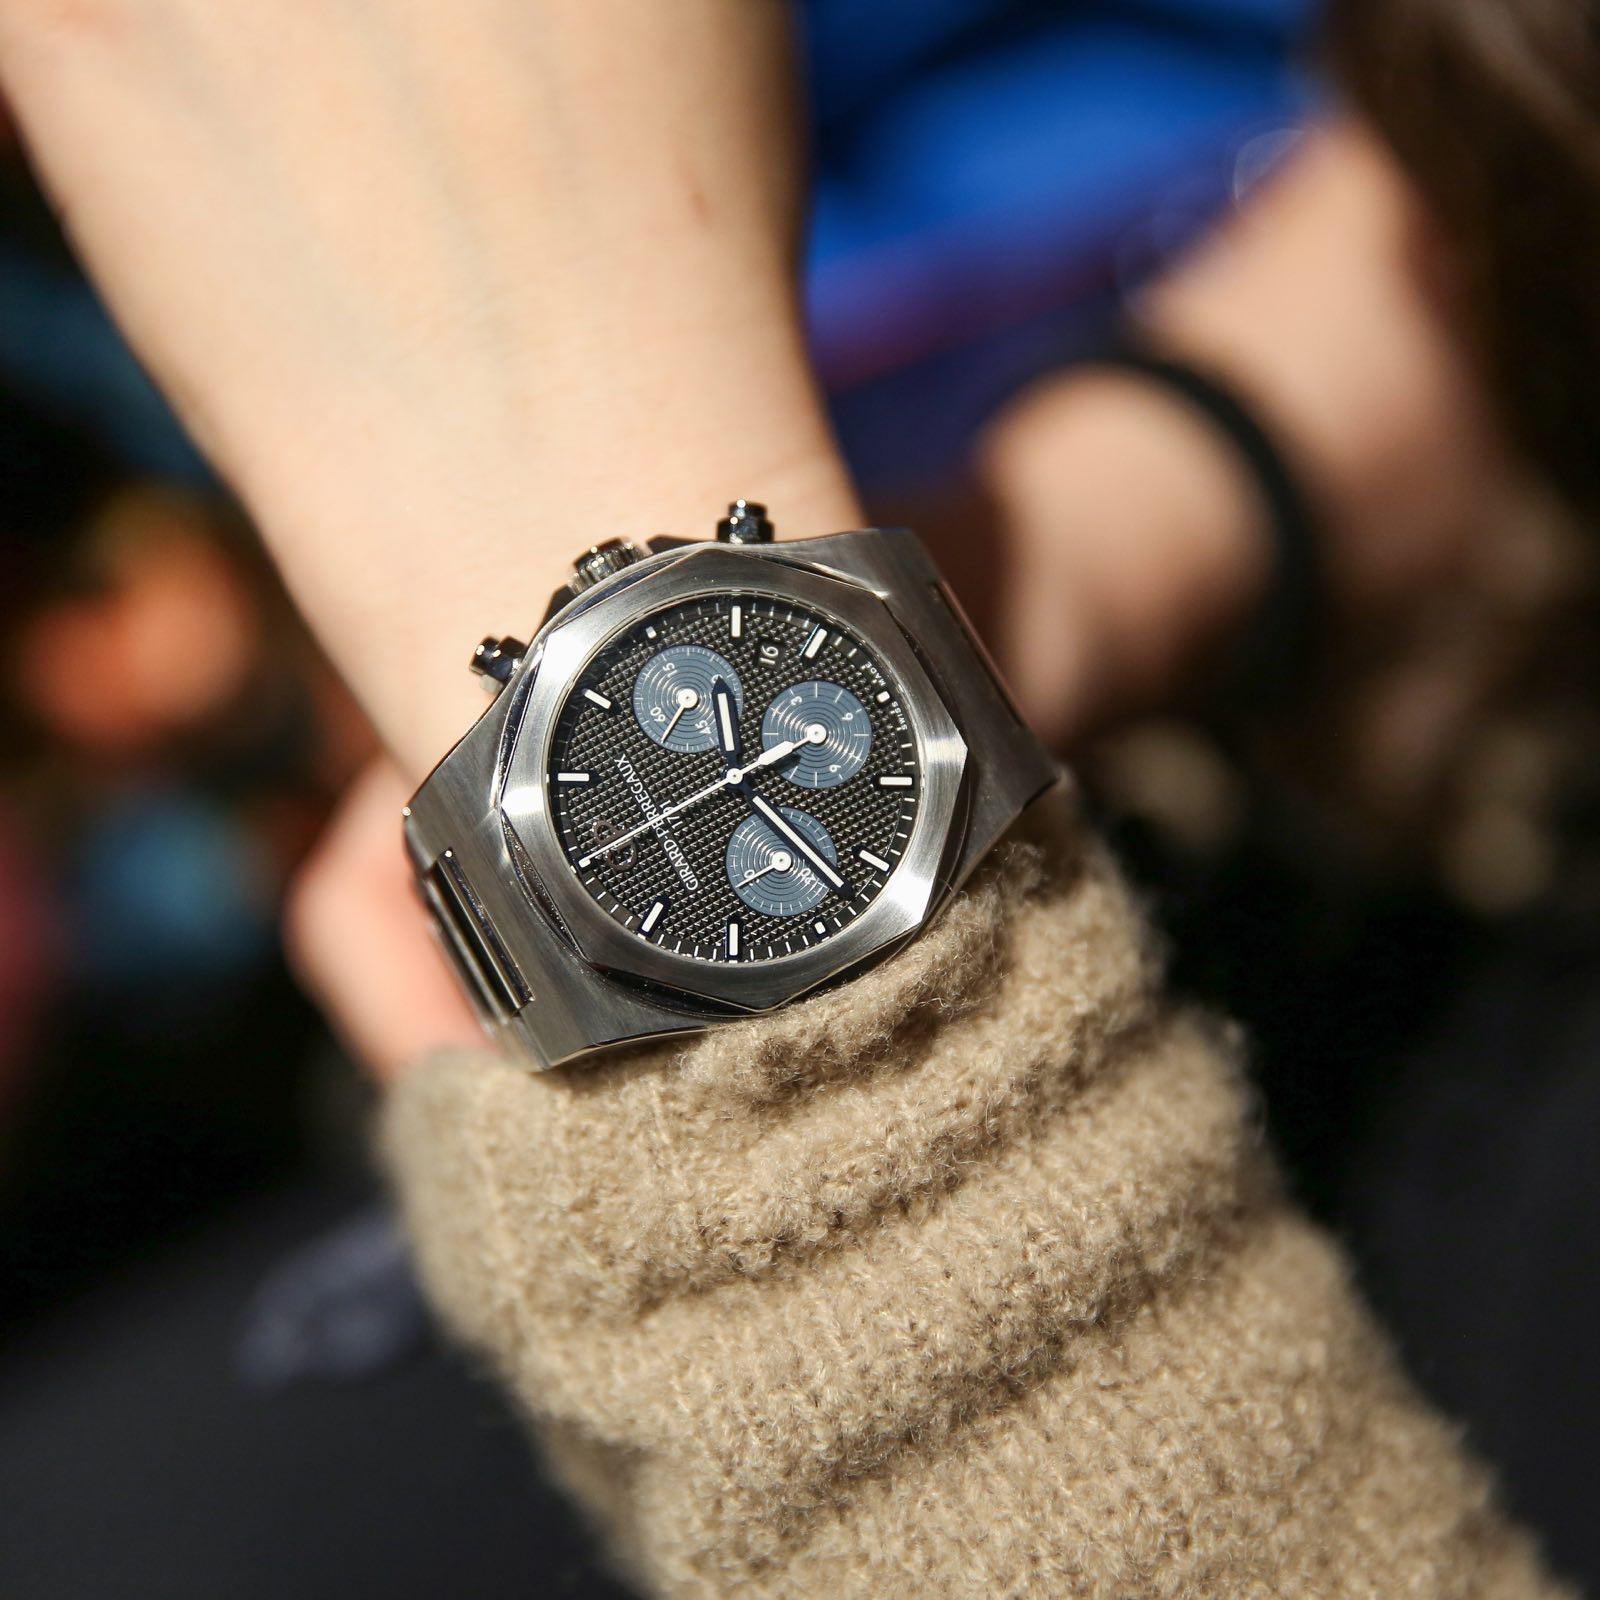 芝柏表 Laureato桂冠系列计时腕表